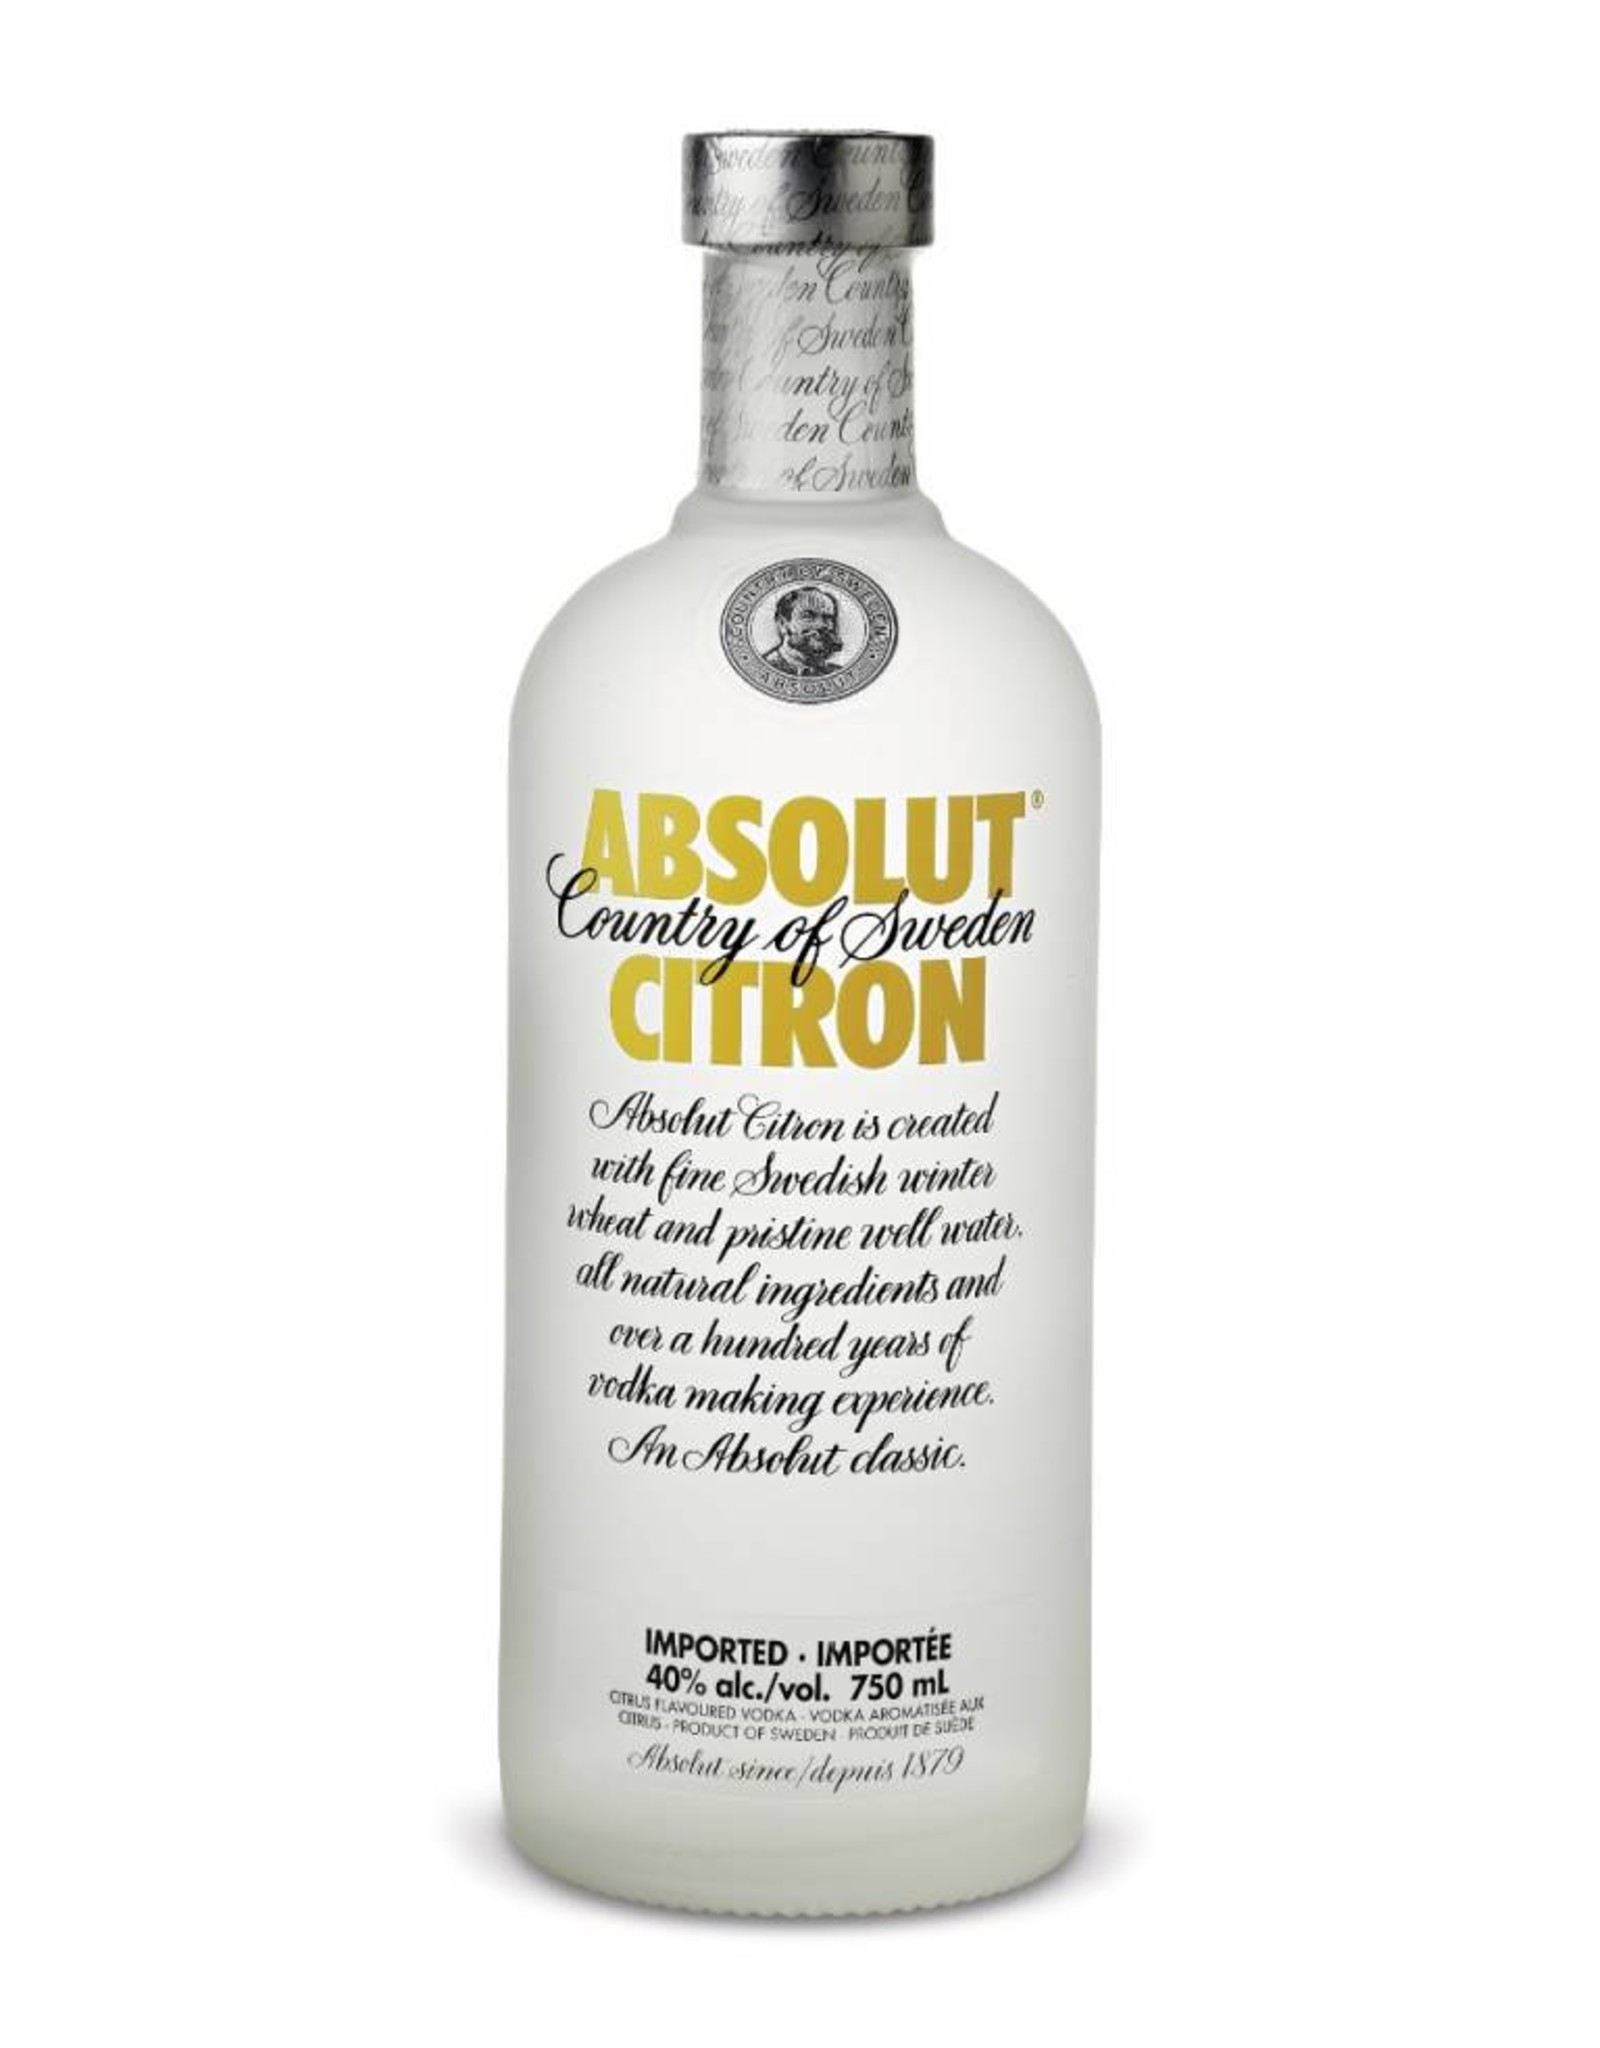 Absolut Citron, Vodka, 40%, 700 ml